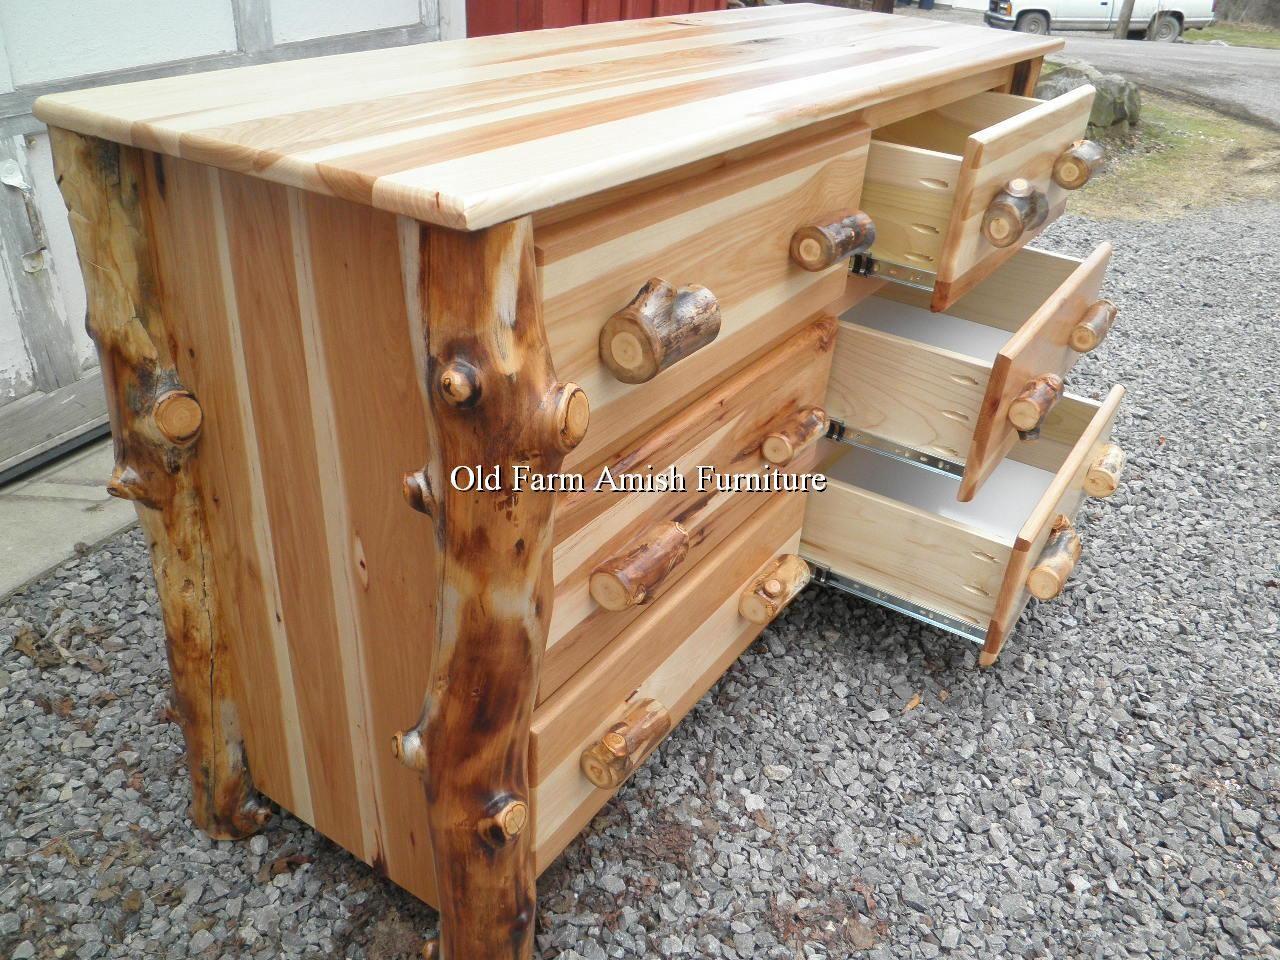 Aspen Log Dresser Old Farm Amish Furniture   Dayton, PA (814) 257